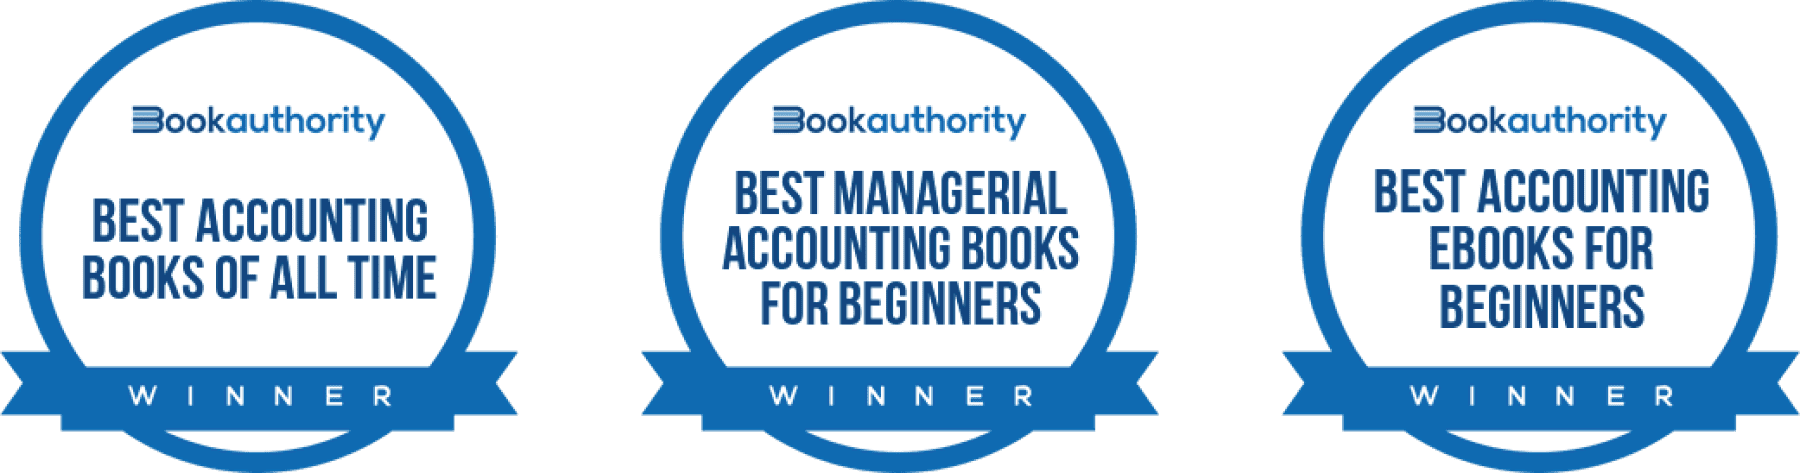 BookAuthorityBadges_Accounting